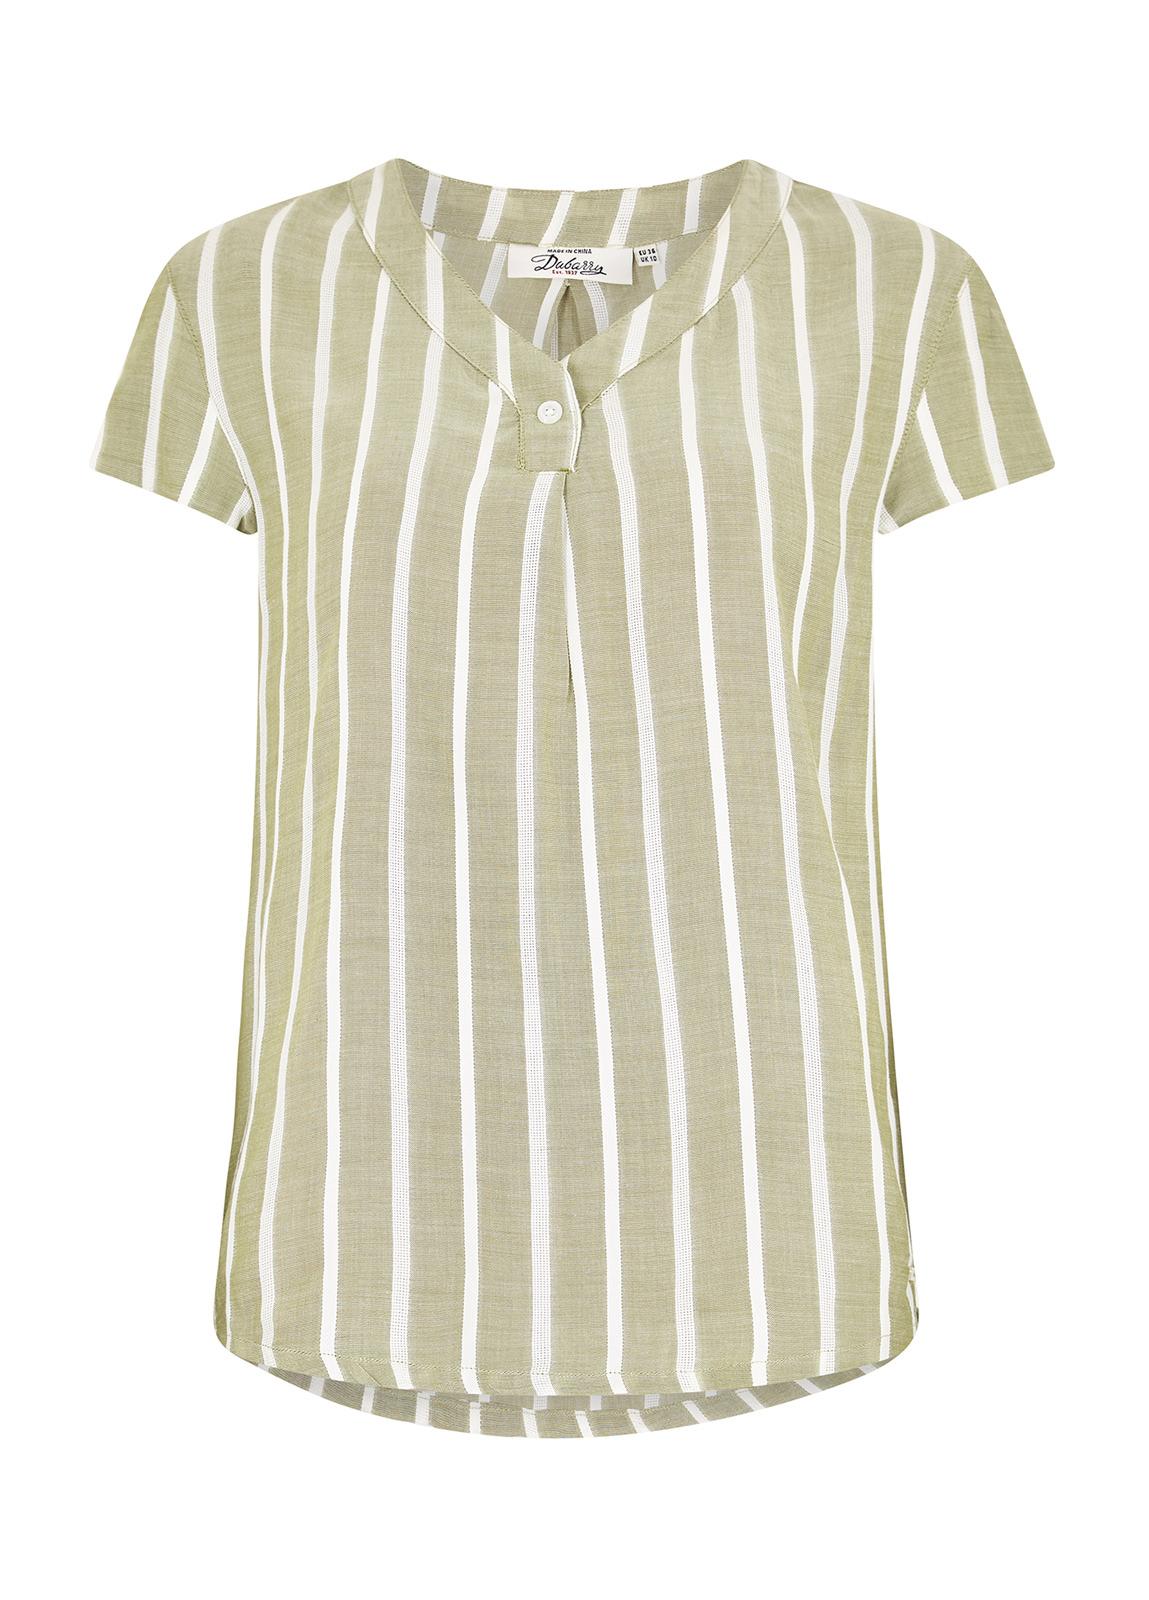 Dubarry_Gardenia Shirt - Tobacco_Image_2